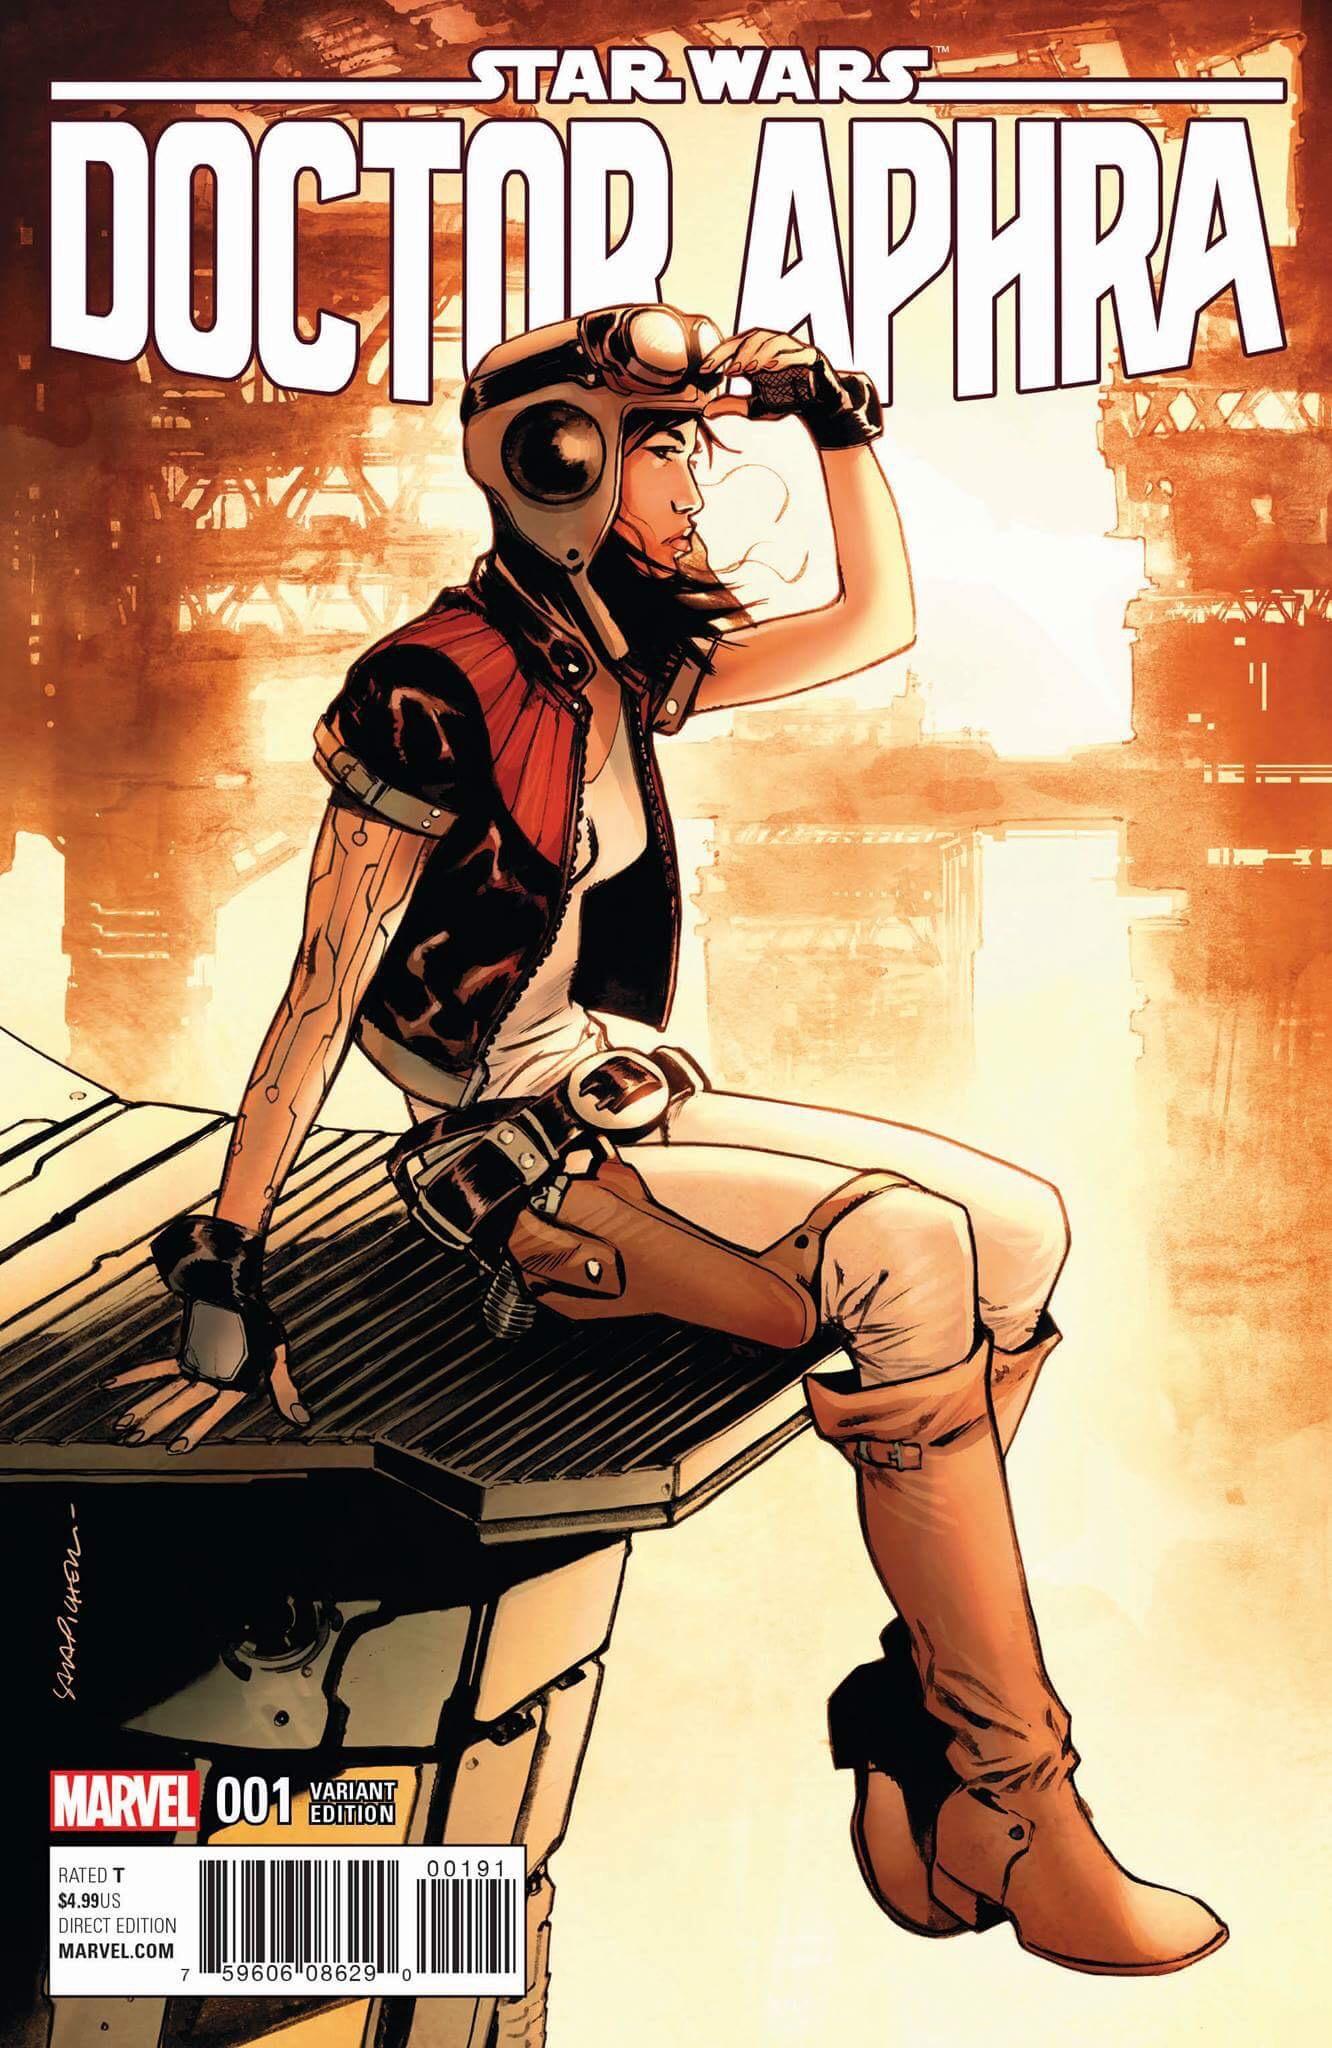 Doctor Aphra #1 (Sara Pichelli 7ate9/Sad Lemon/Frankie's Comics Variant Cover) (07.12.2016)